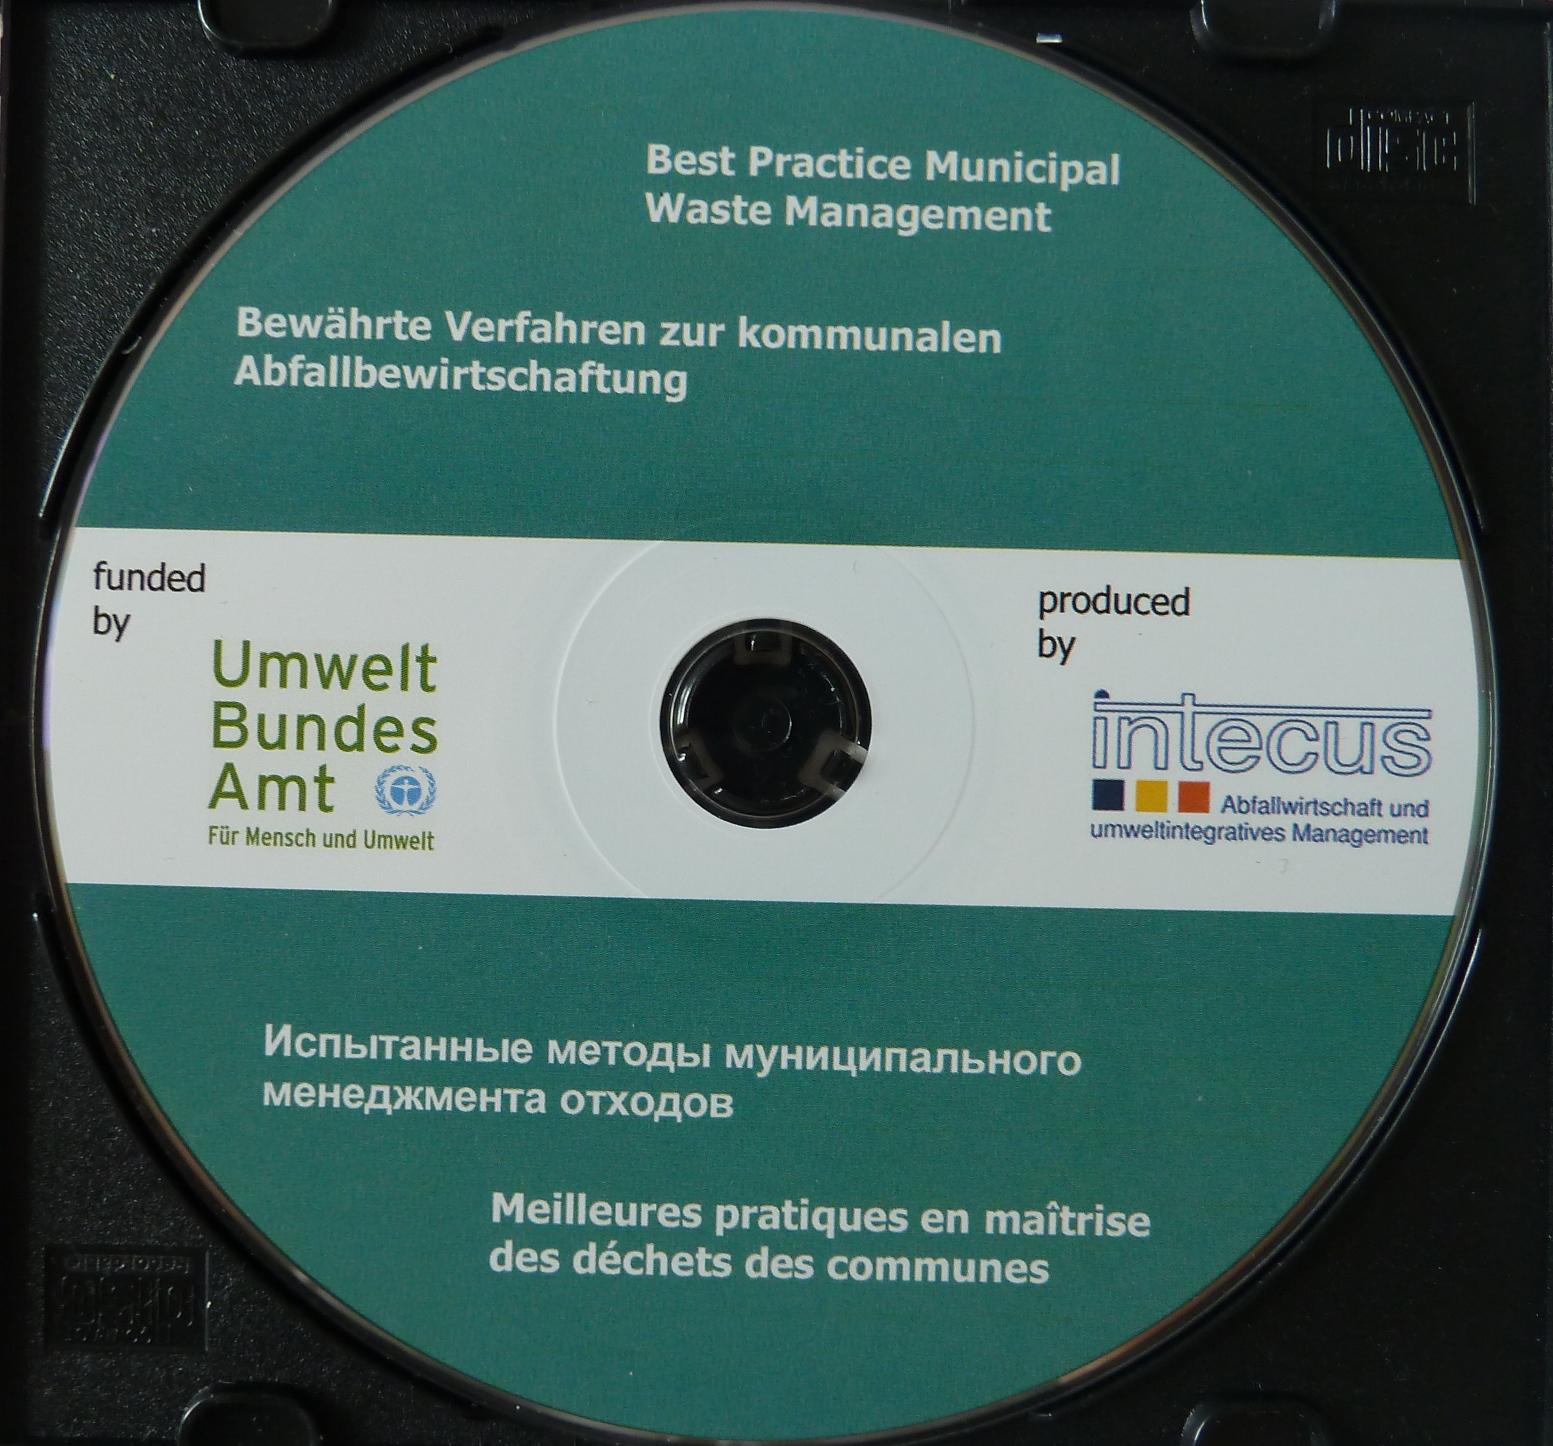 Waste technology transfer | Umweltbundesamt